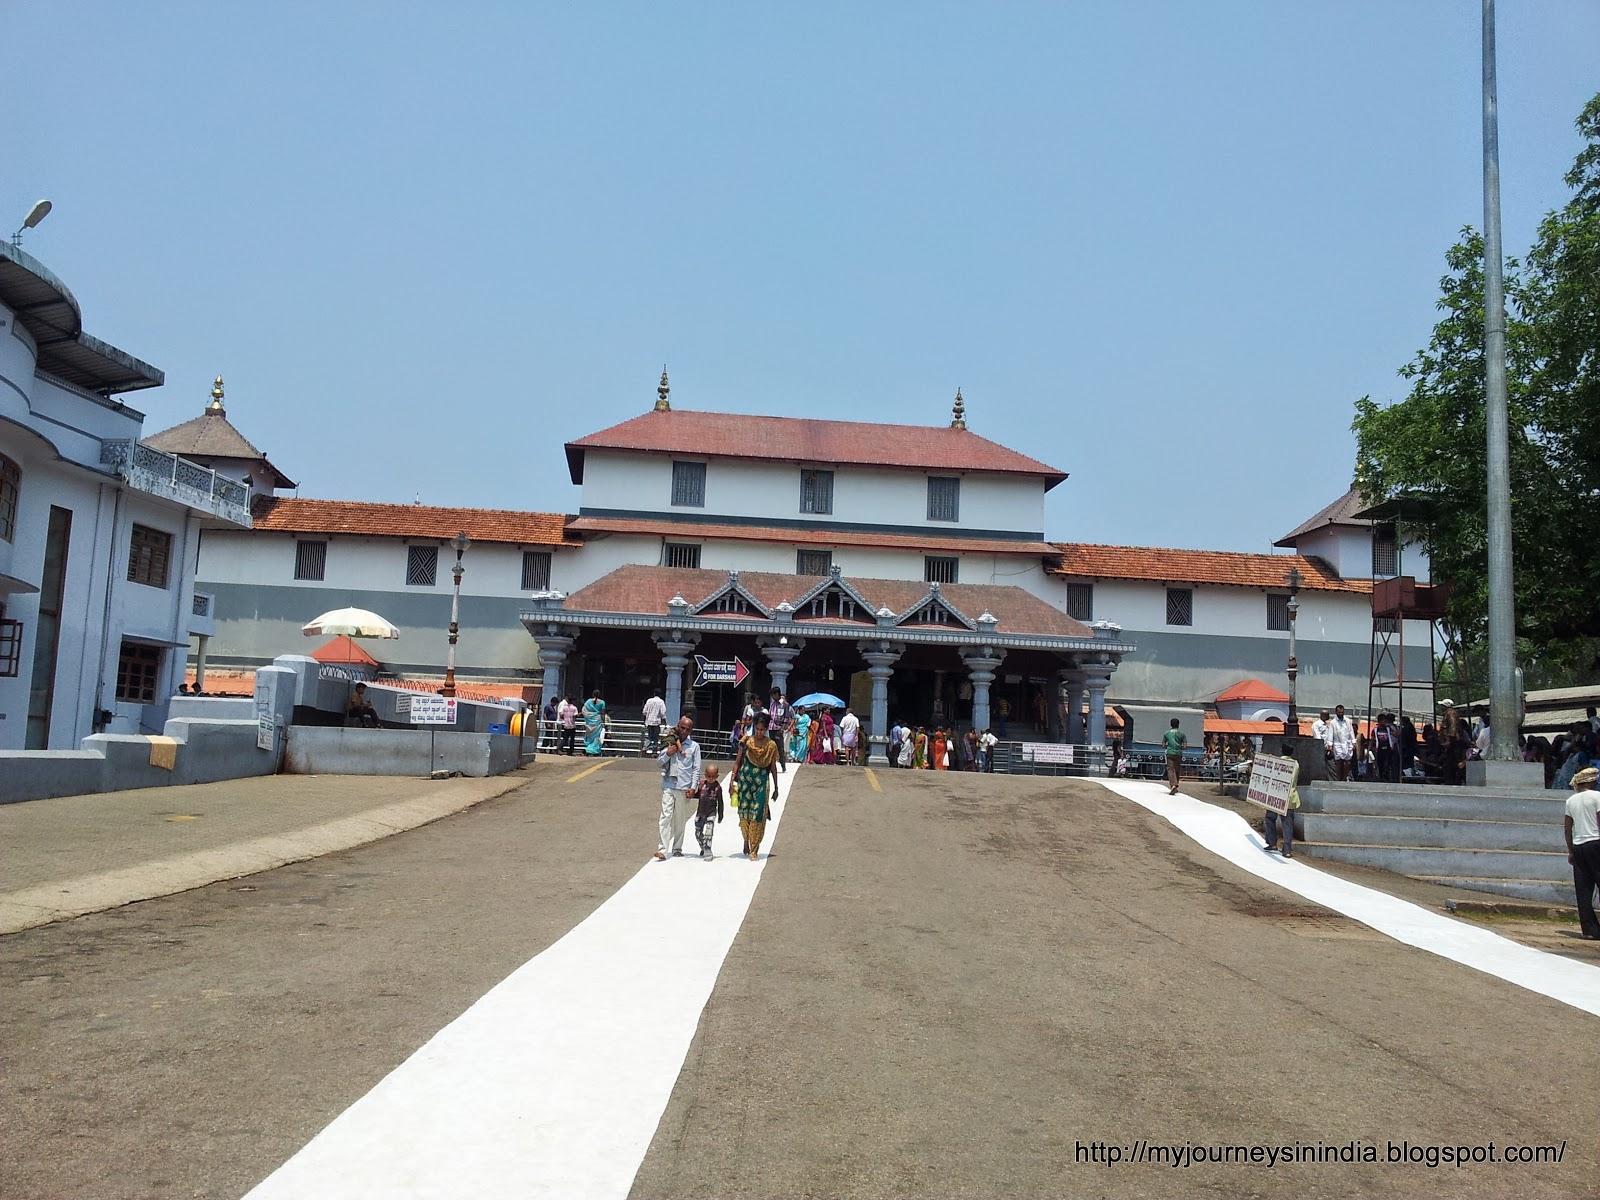 Dharmastala